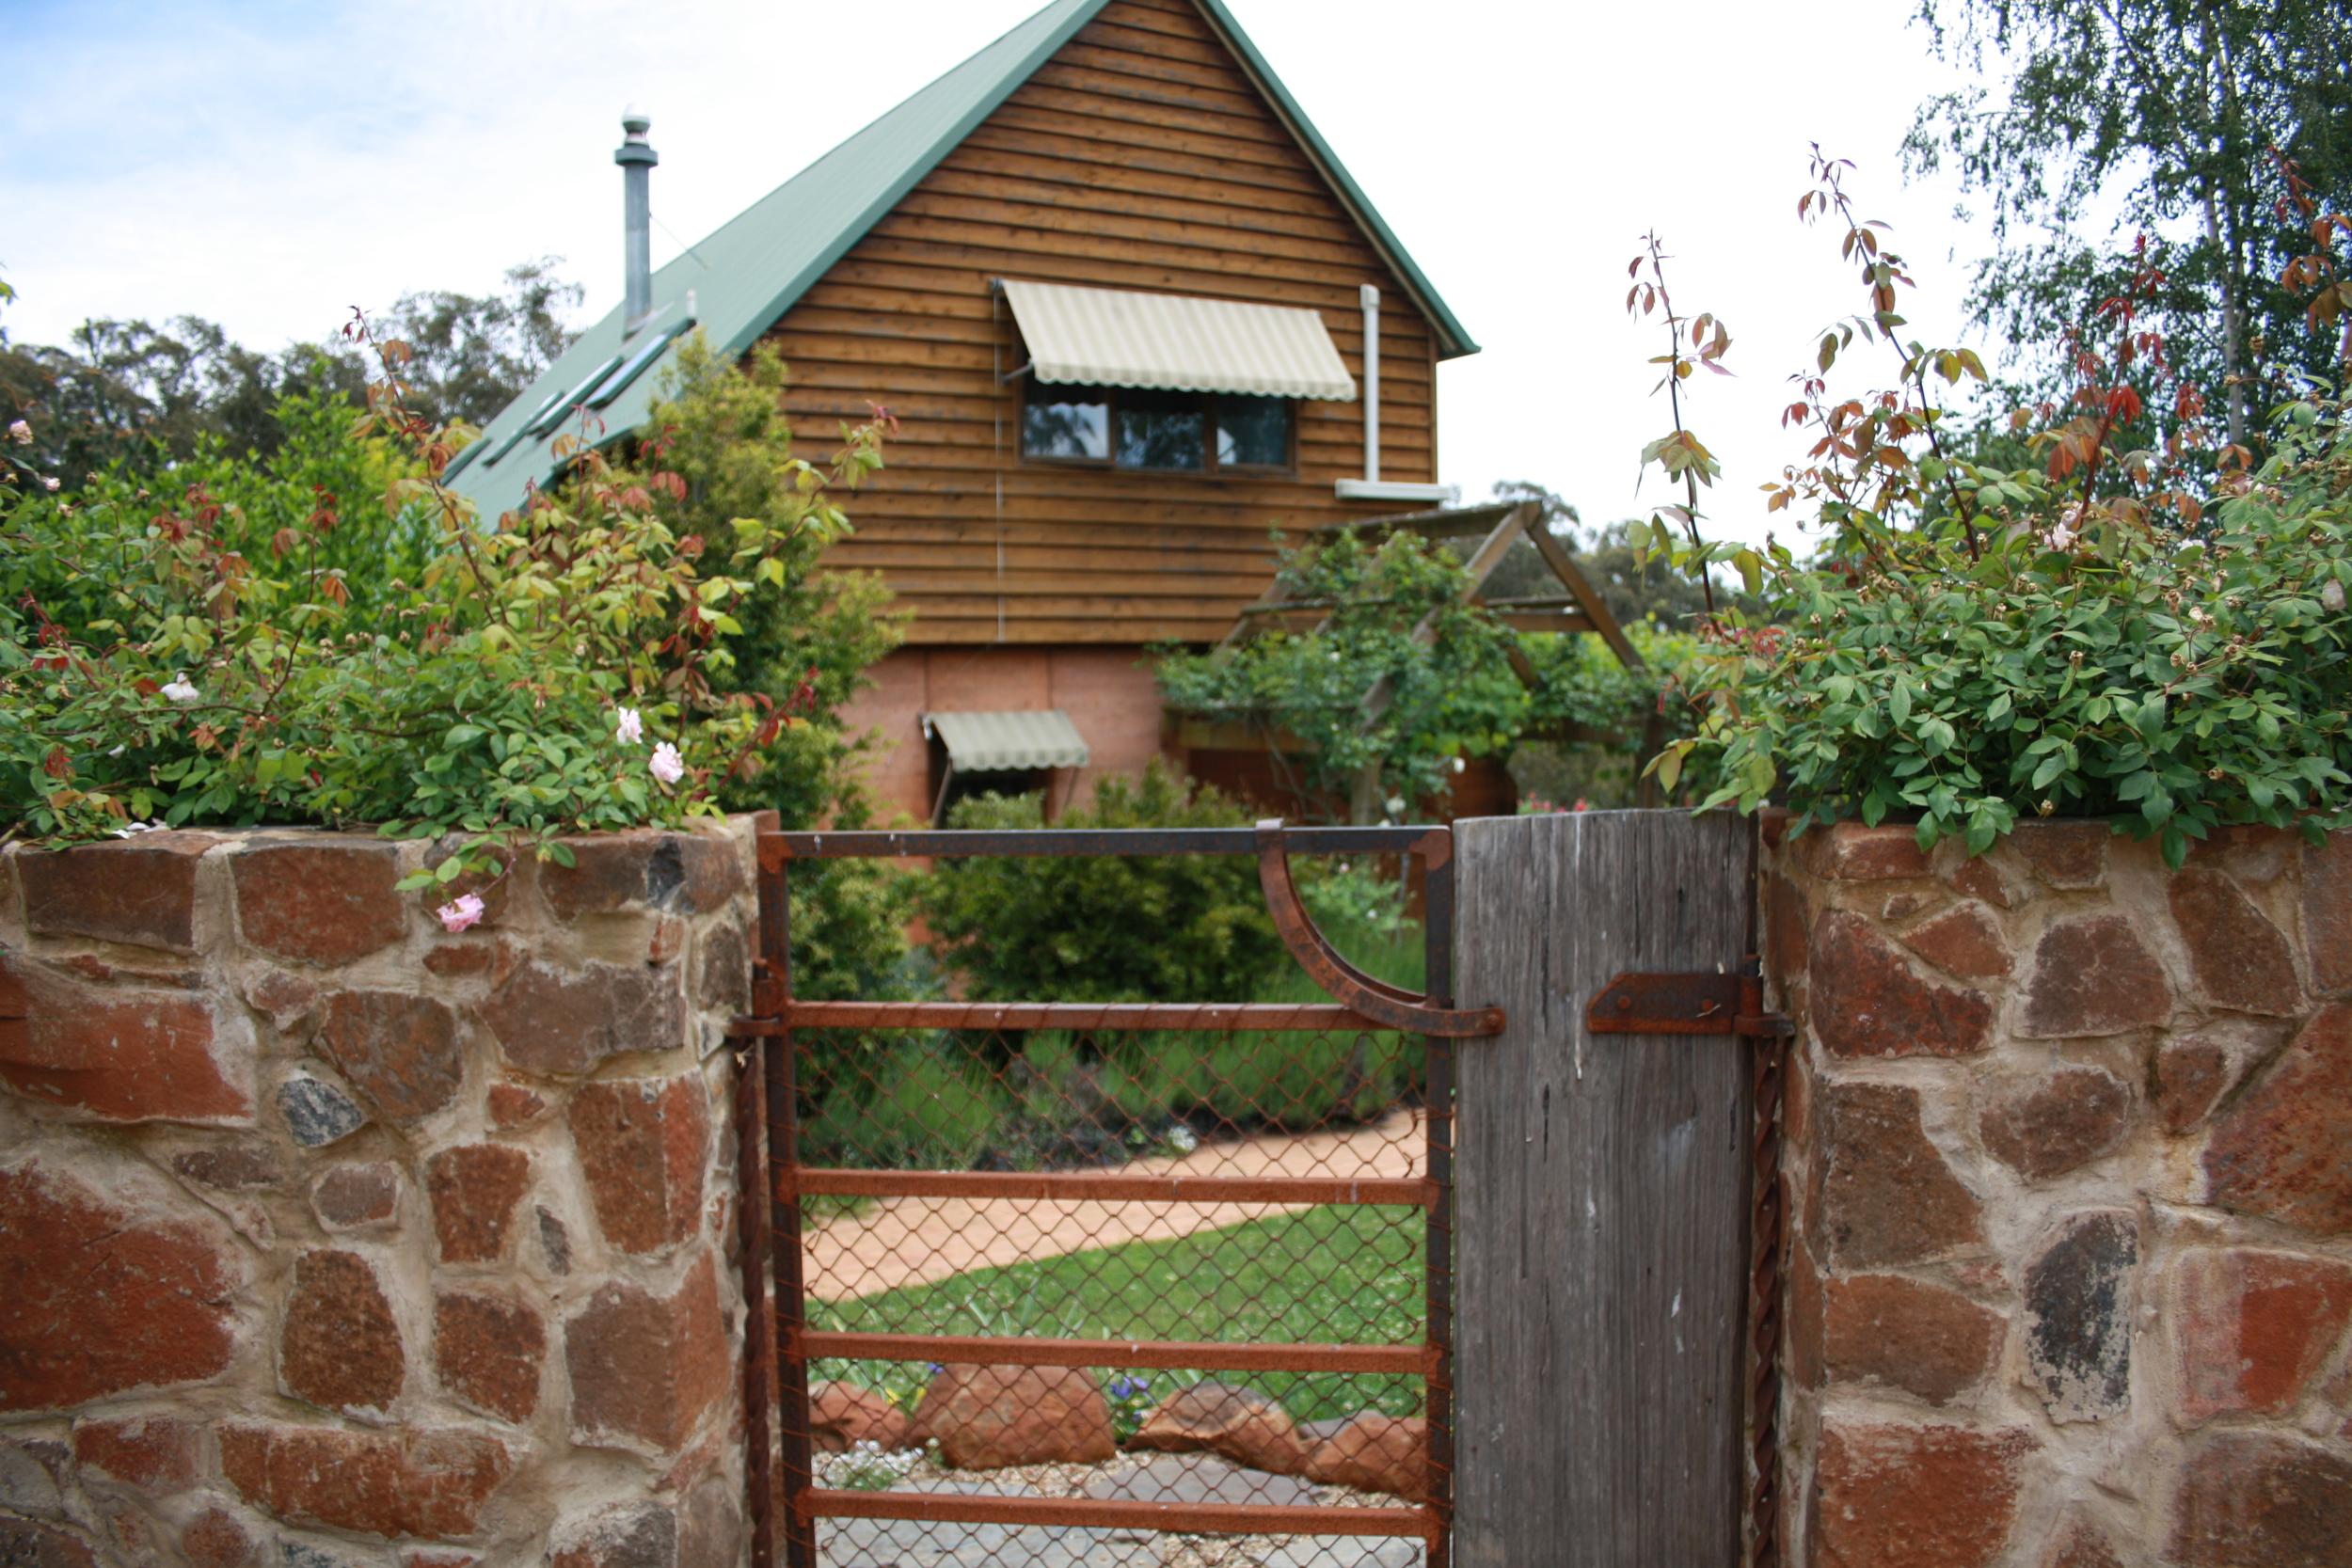 Andrew_Economos_Custom_Builder_Bowral_NSW_Australia_Earth_Home_14.JPG